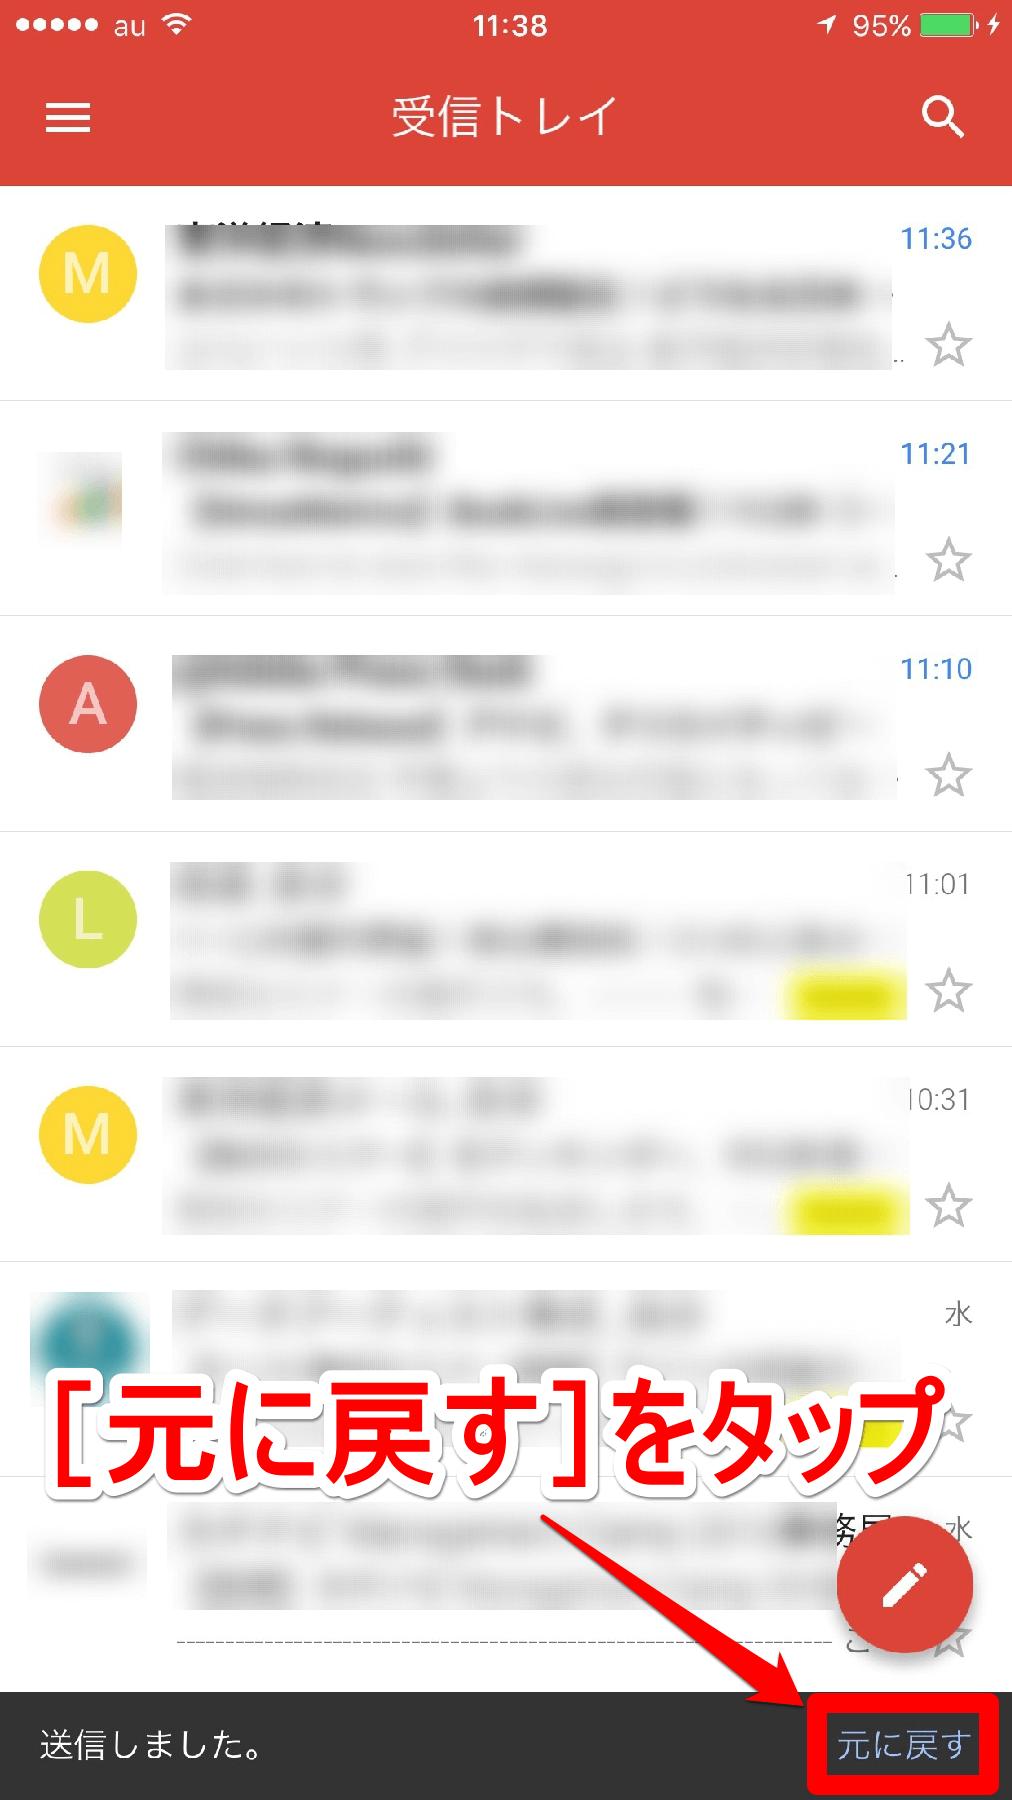 iPhoneの[Gmail]アプリの受信トレイ画面